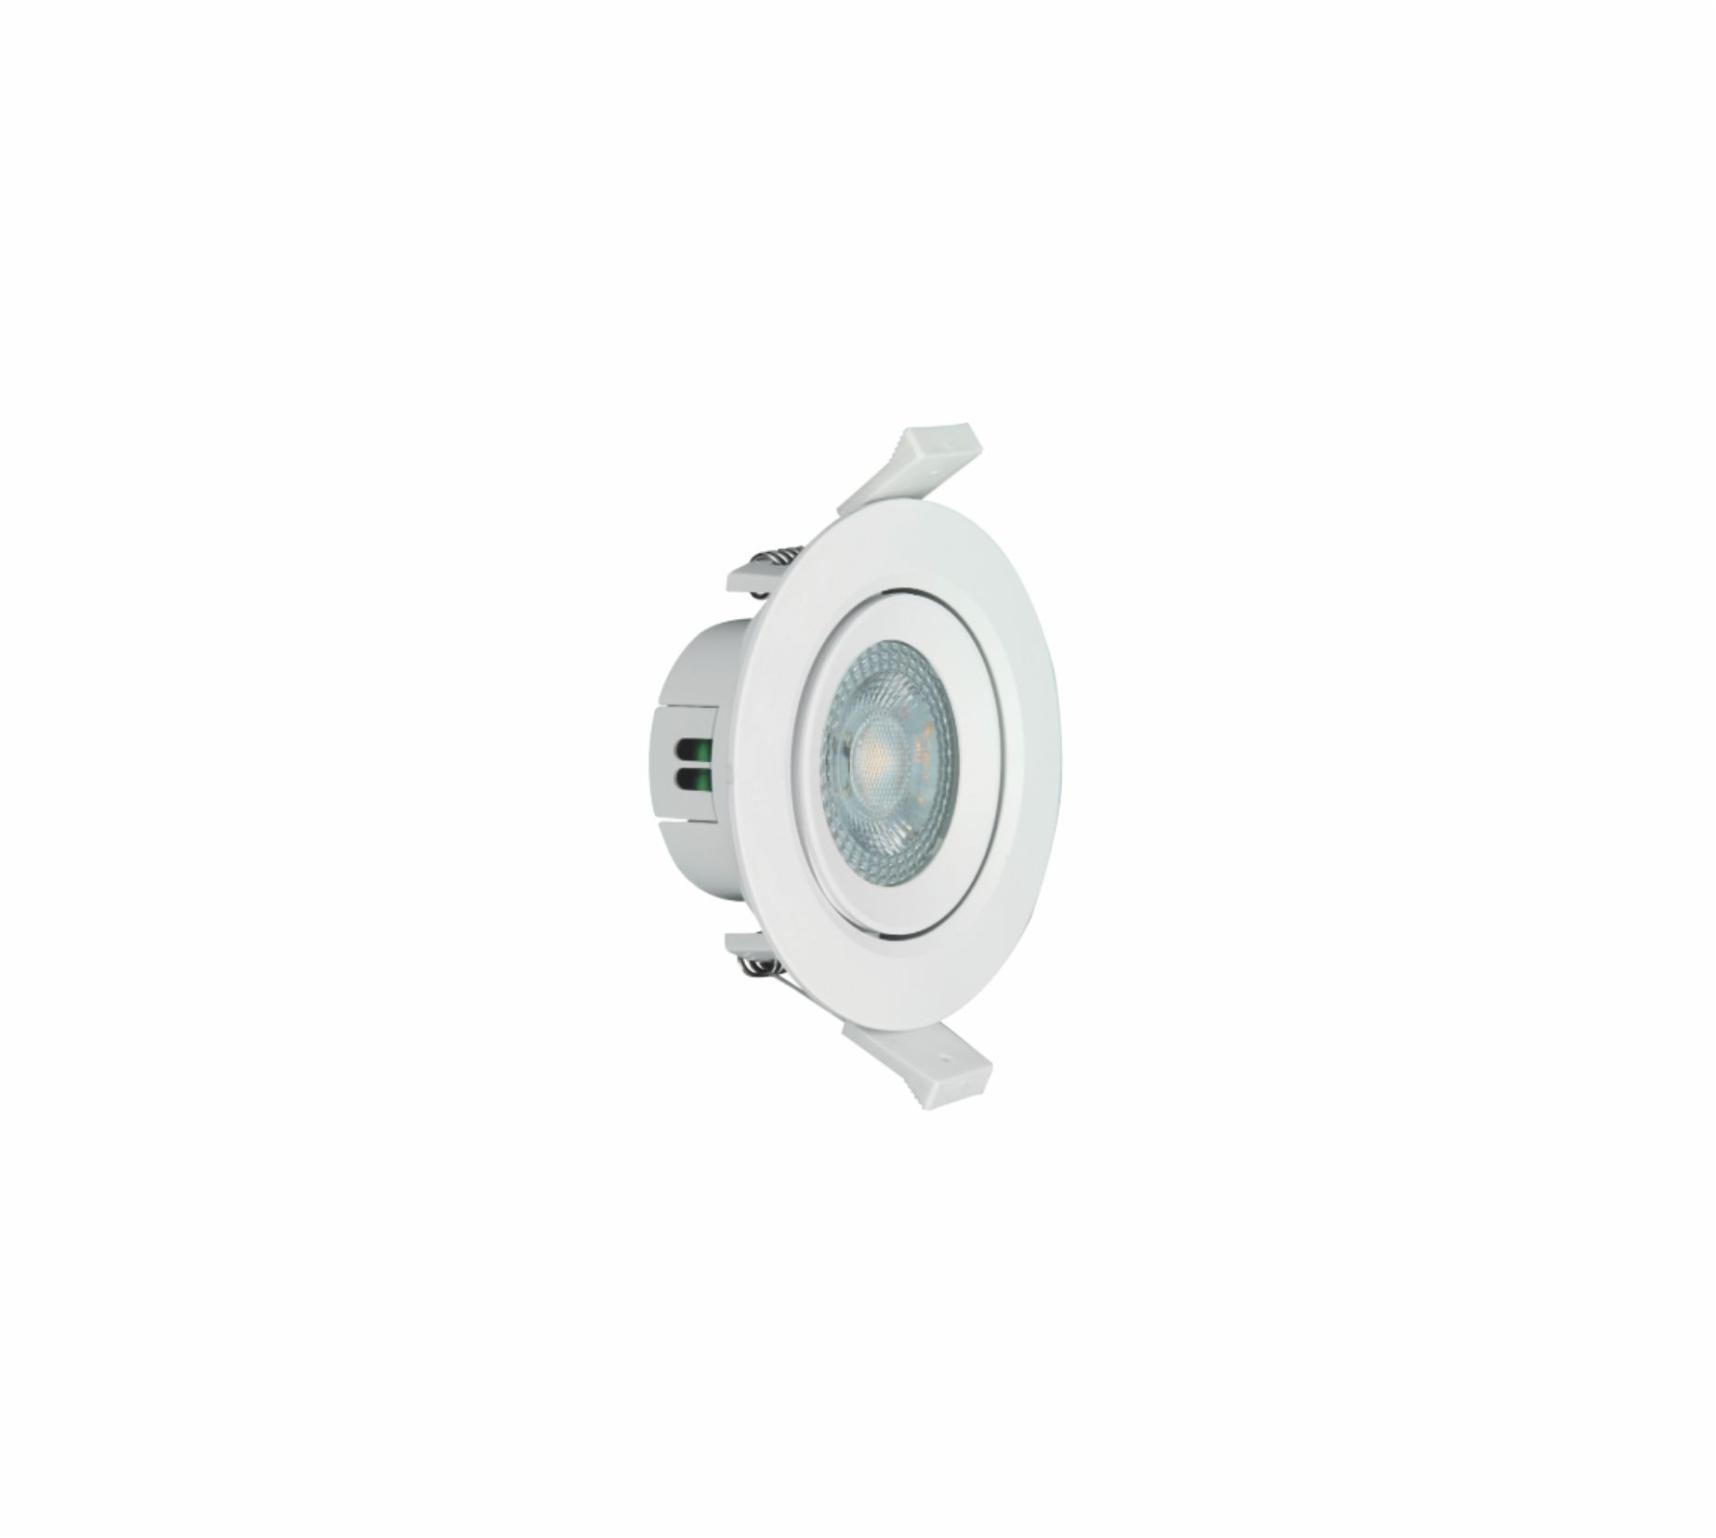 SPOT LED MR11 redondo branco 3,5W AUTOVOLT 6500K